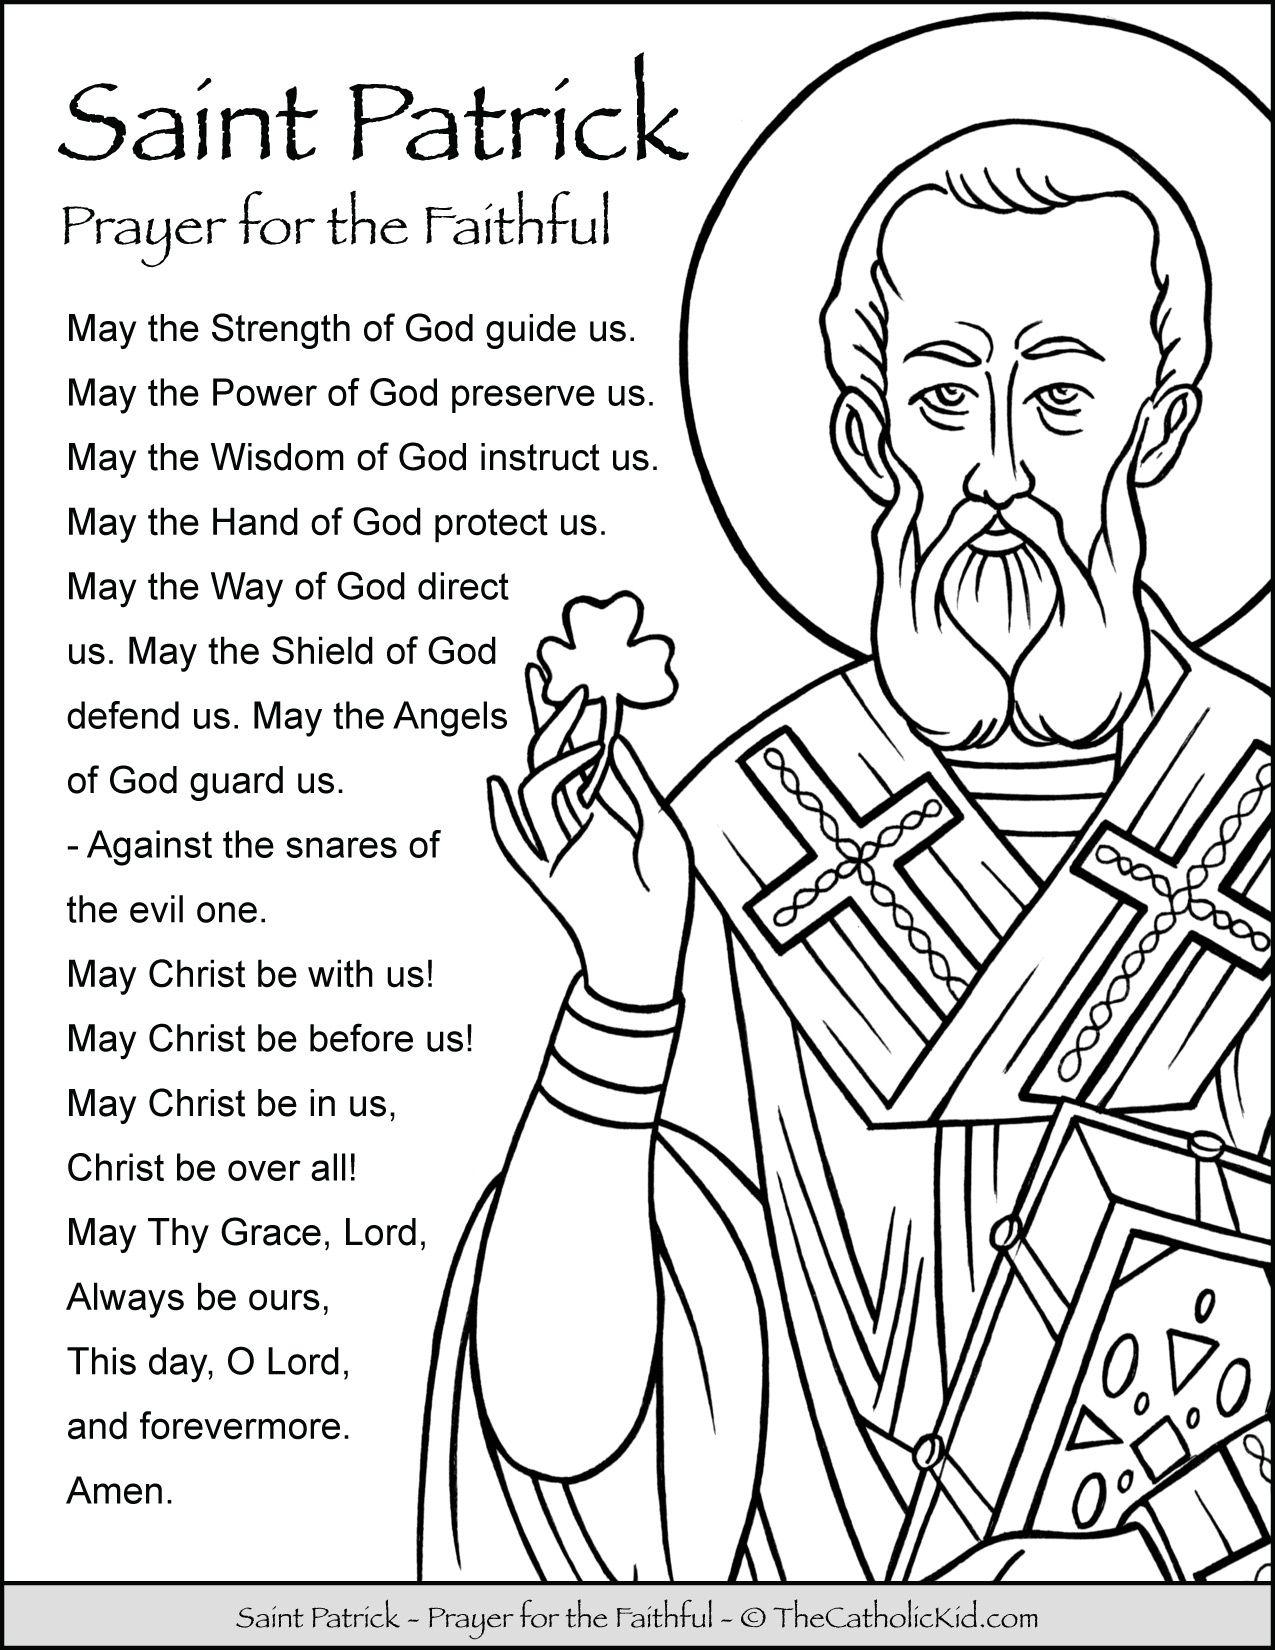 Saint Patrick Prayer Coloring Page St Patrick Prayer St Patrick Catholic Coloring